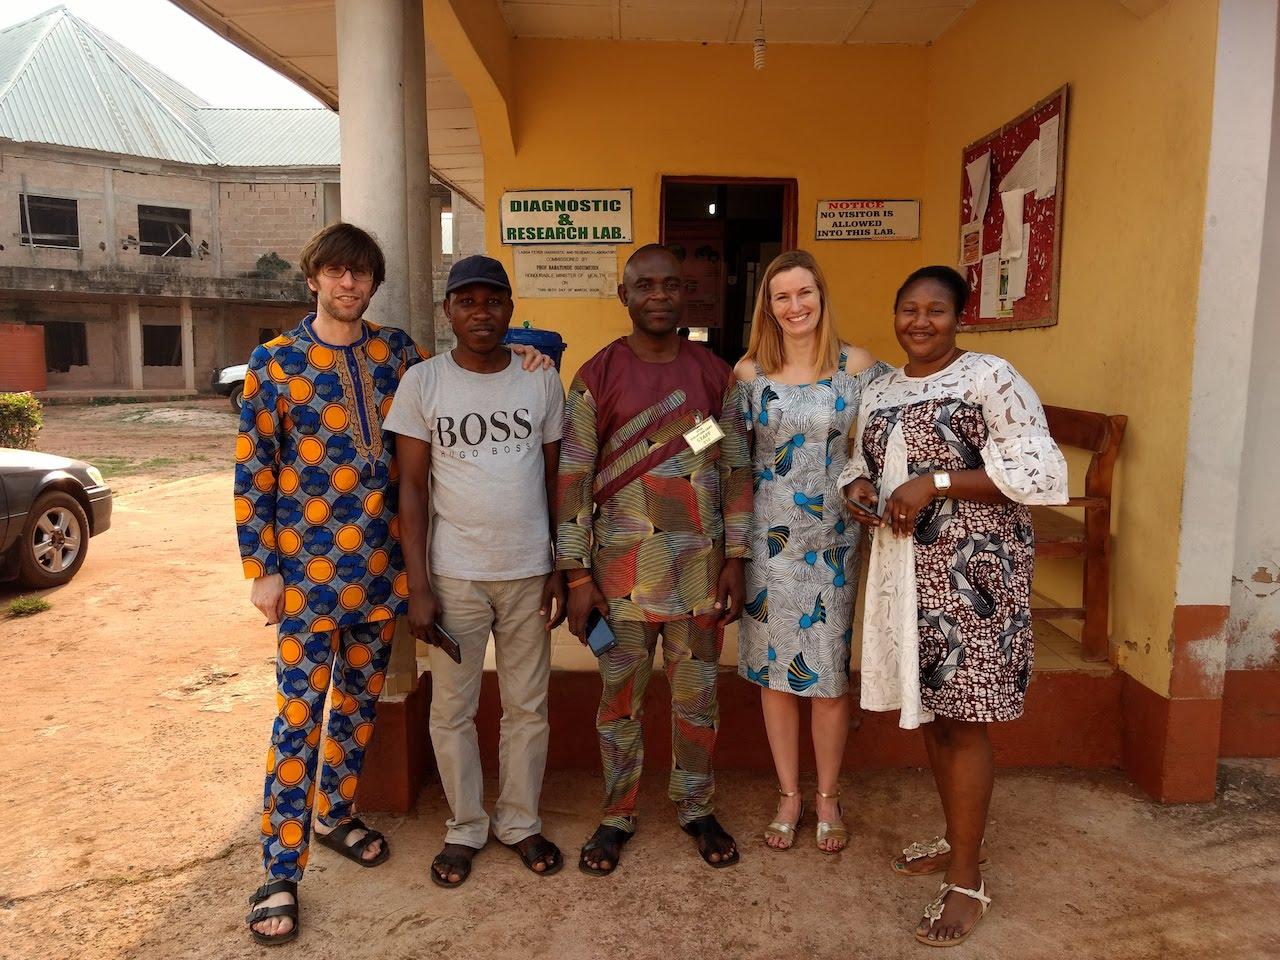 Wearing traditional Nigeran dresses. Right to left: Eghosa Uyige, Kayla Barnes, Ikponmwosa Odia, John Aiyepada, and myself